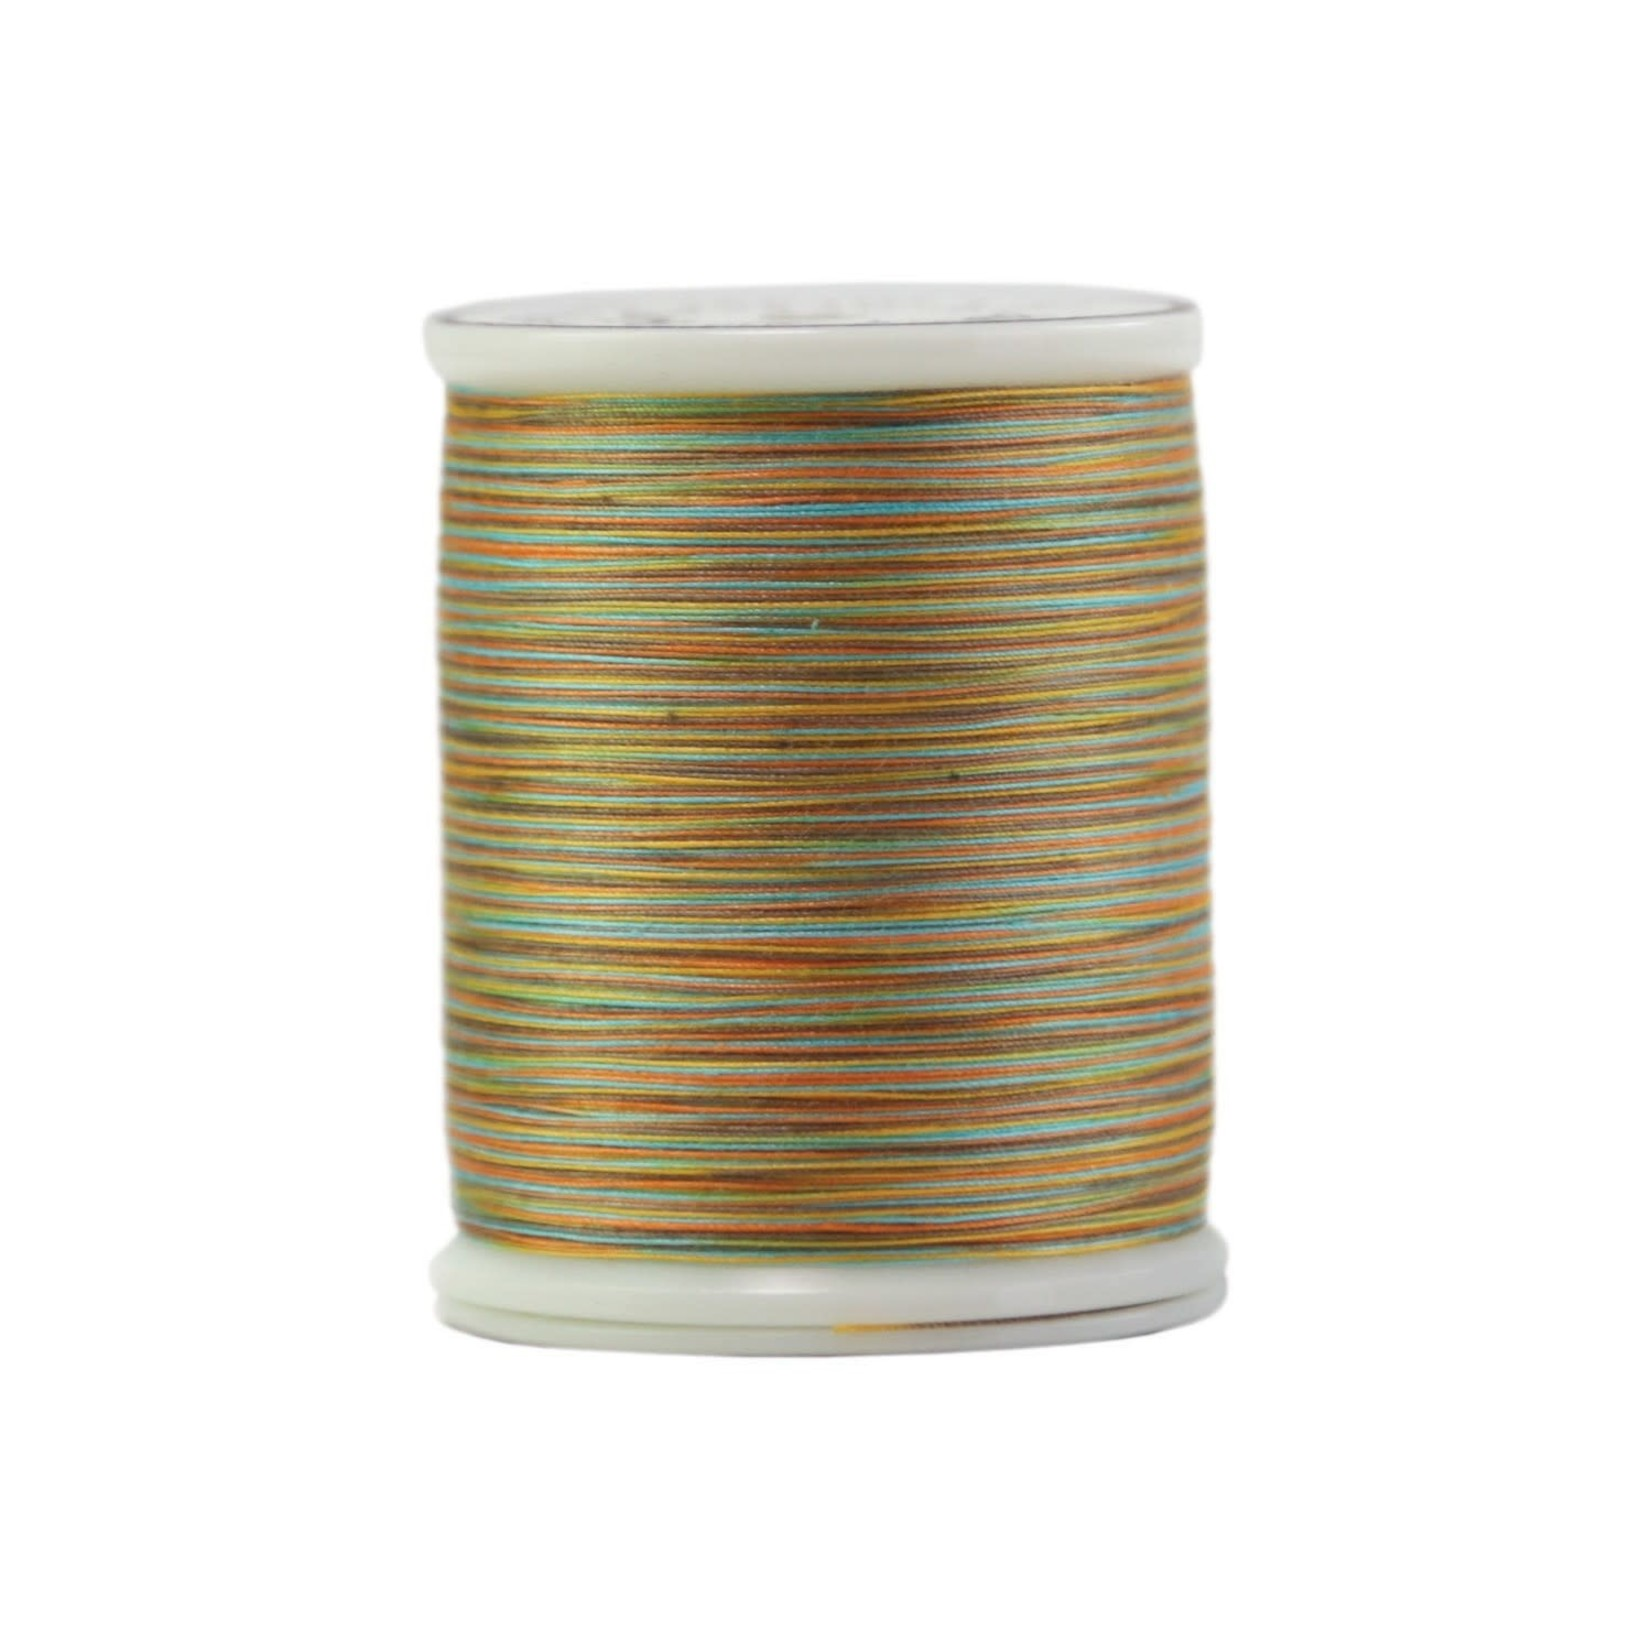 Superior Threads King Tut - #40 - 457 m - 1062 Southwest Soul